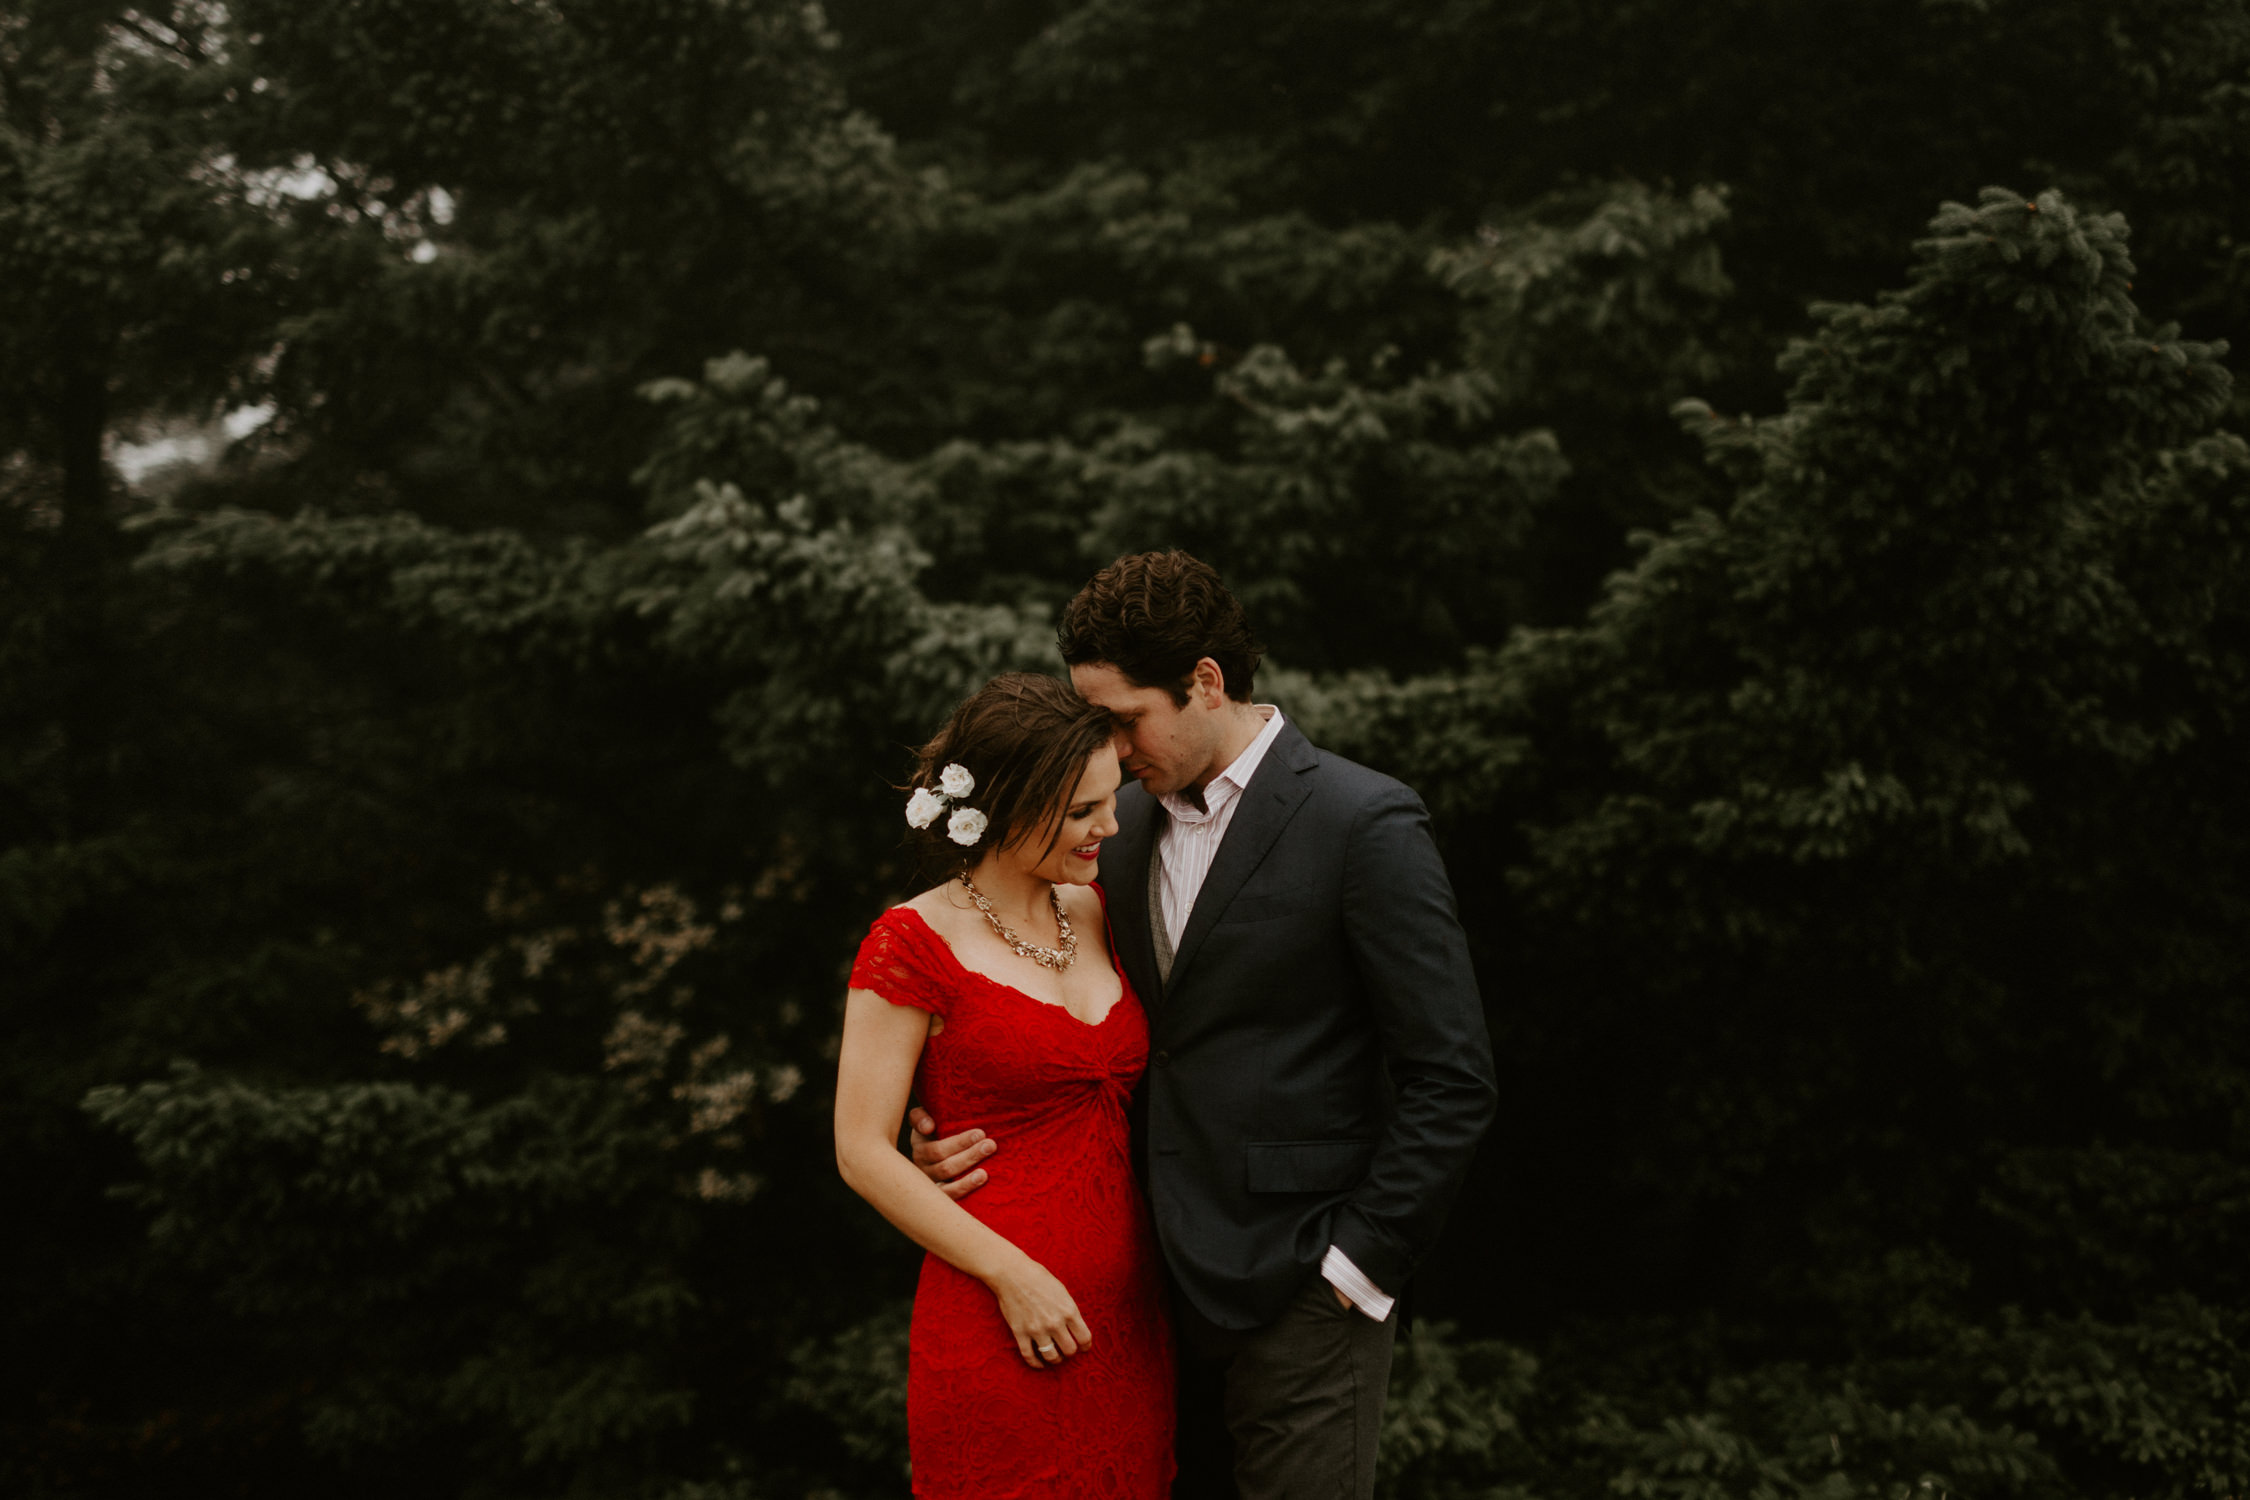 couple-intimate-engagement-session-mt-tam-18.jpg